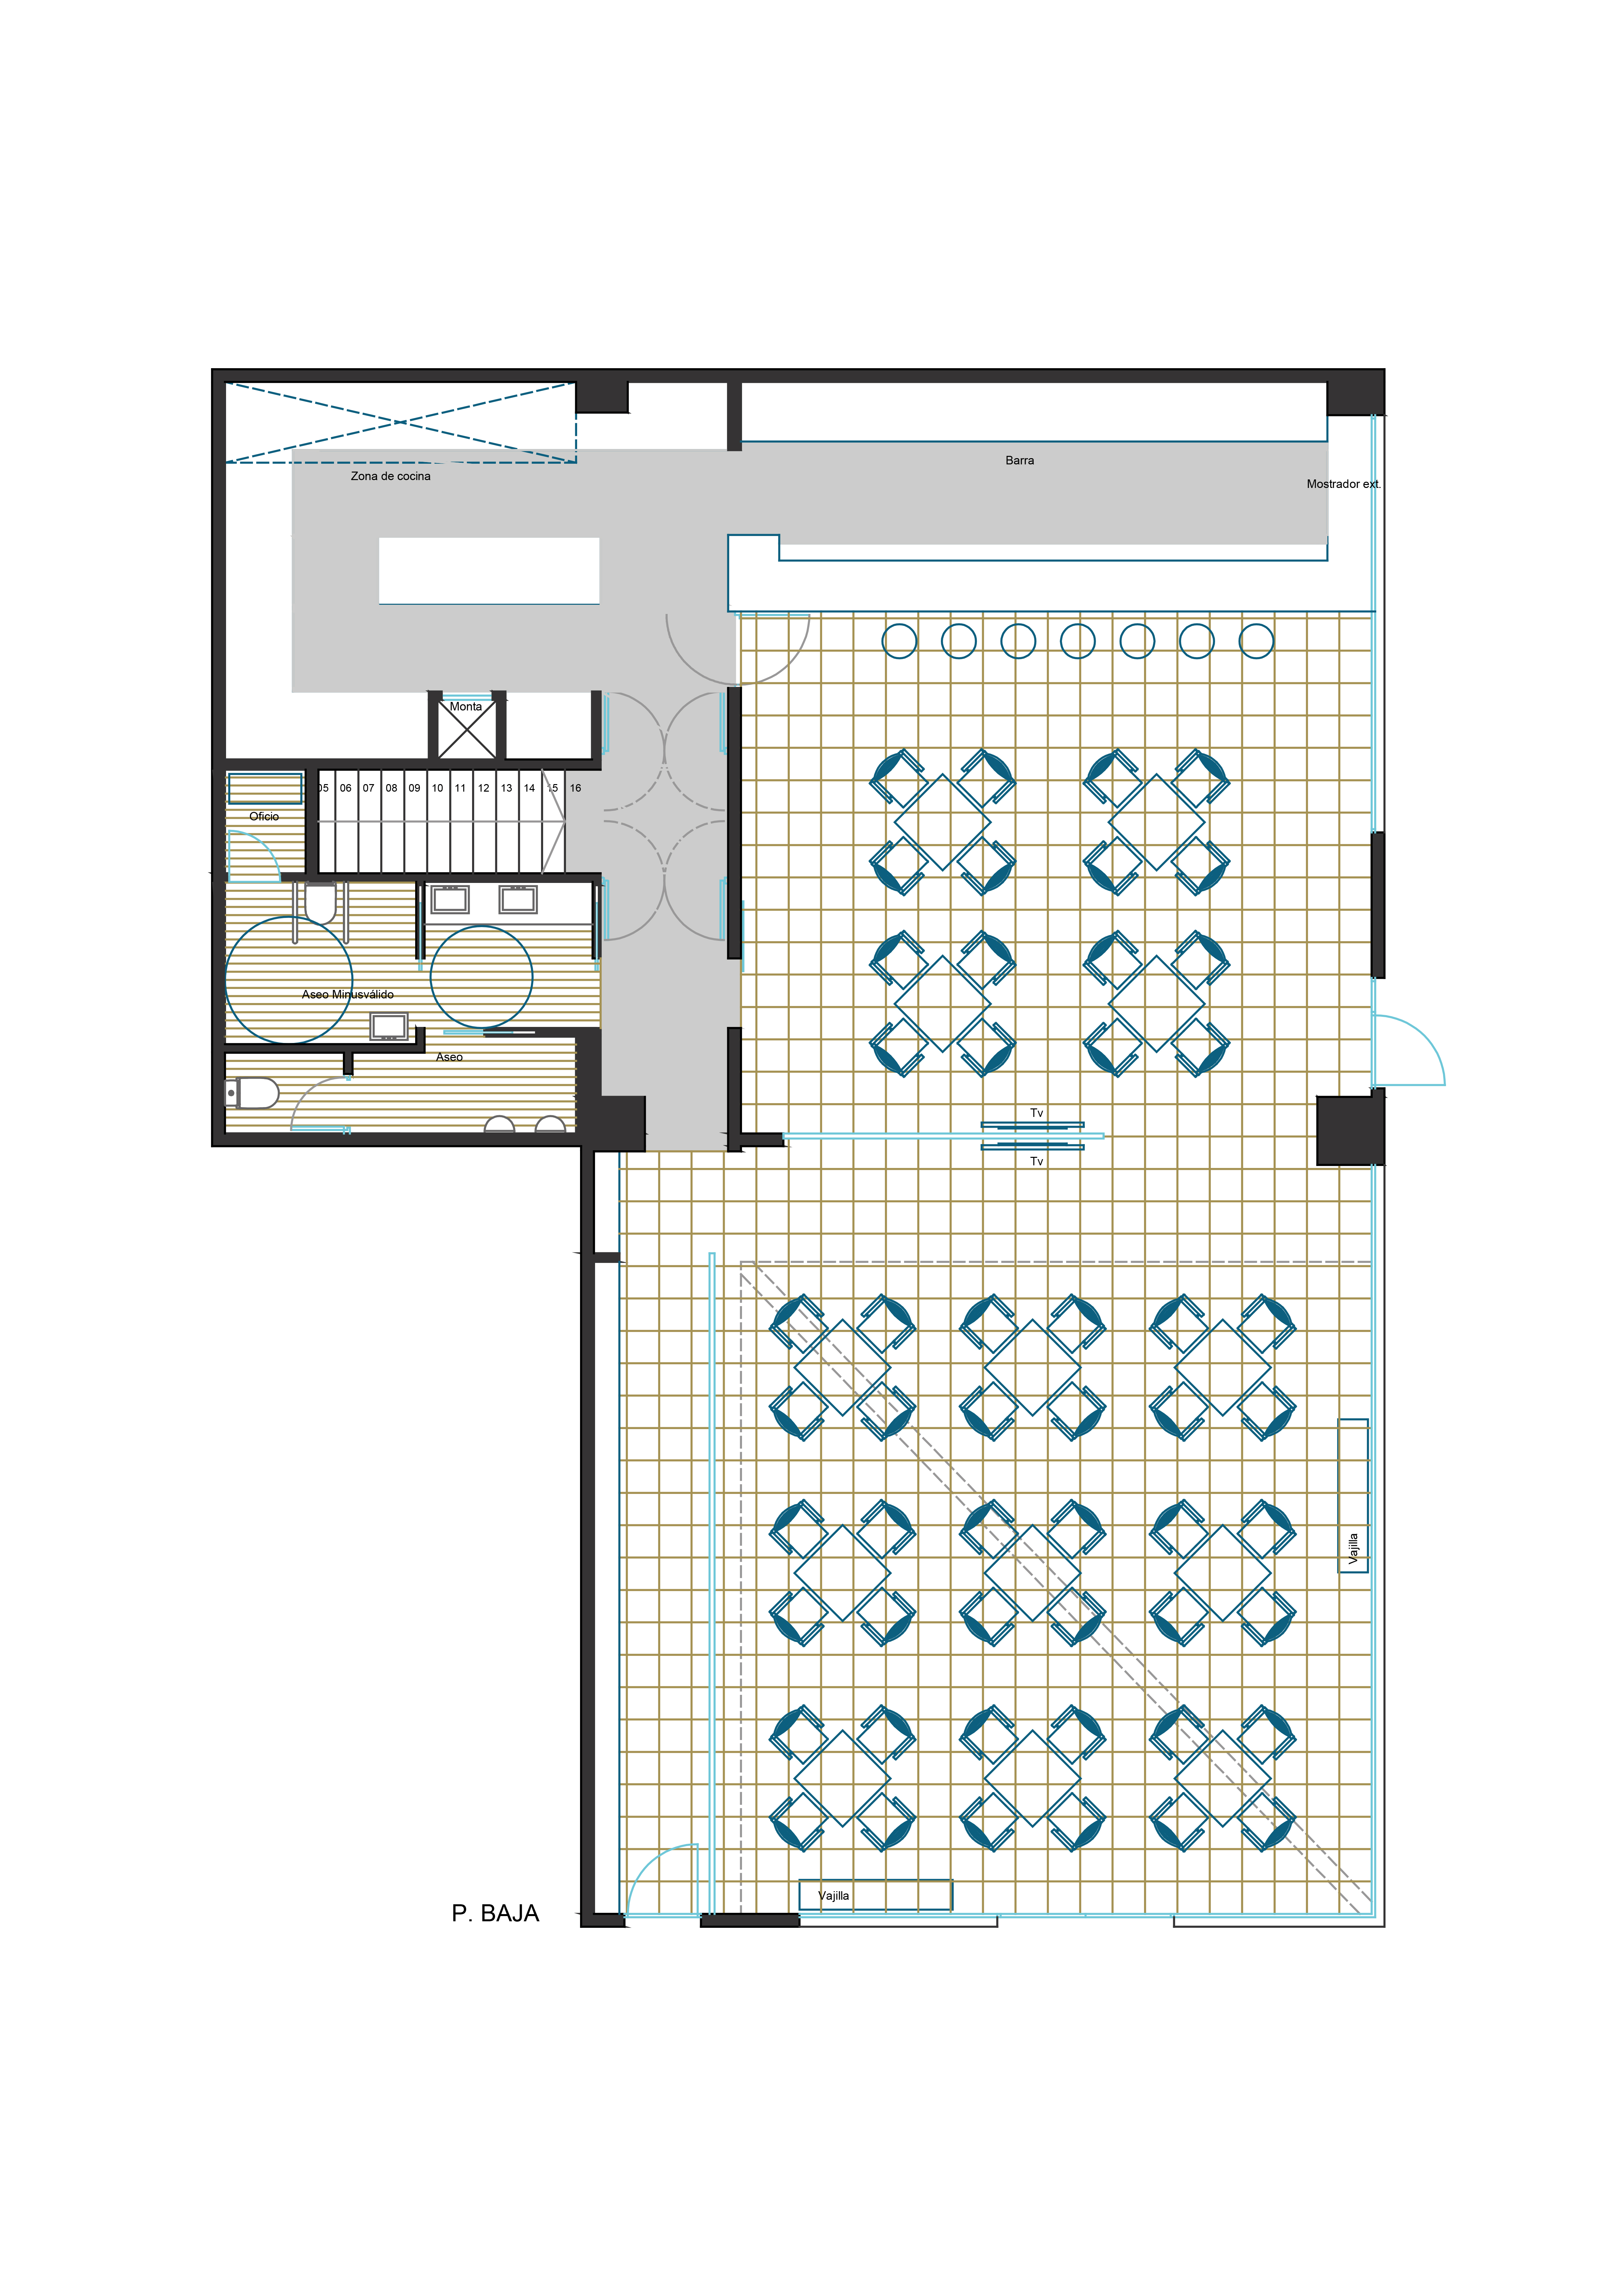 Restaurante boss madrid herrero arquitectos for Restaurante escuela de arquitectos madrid